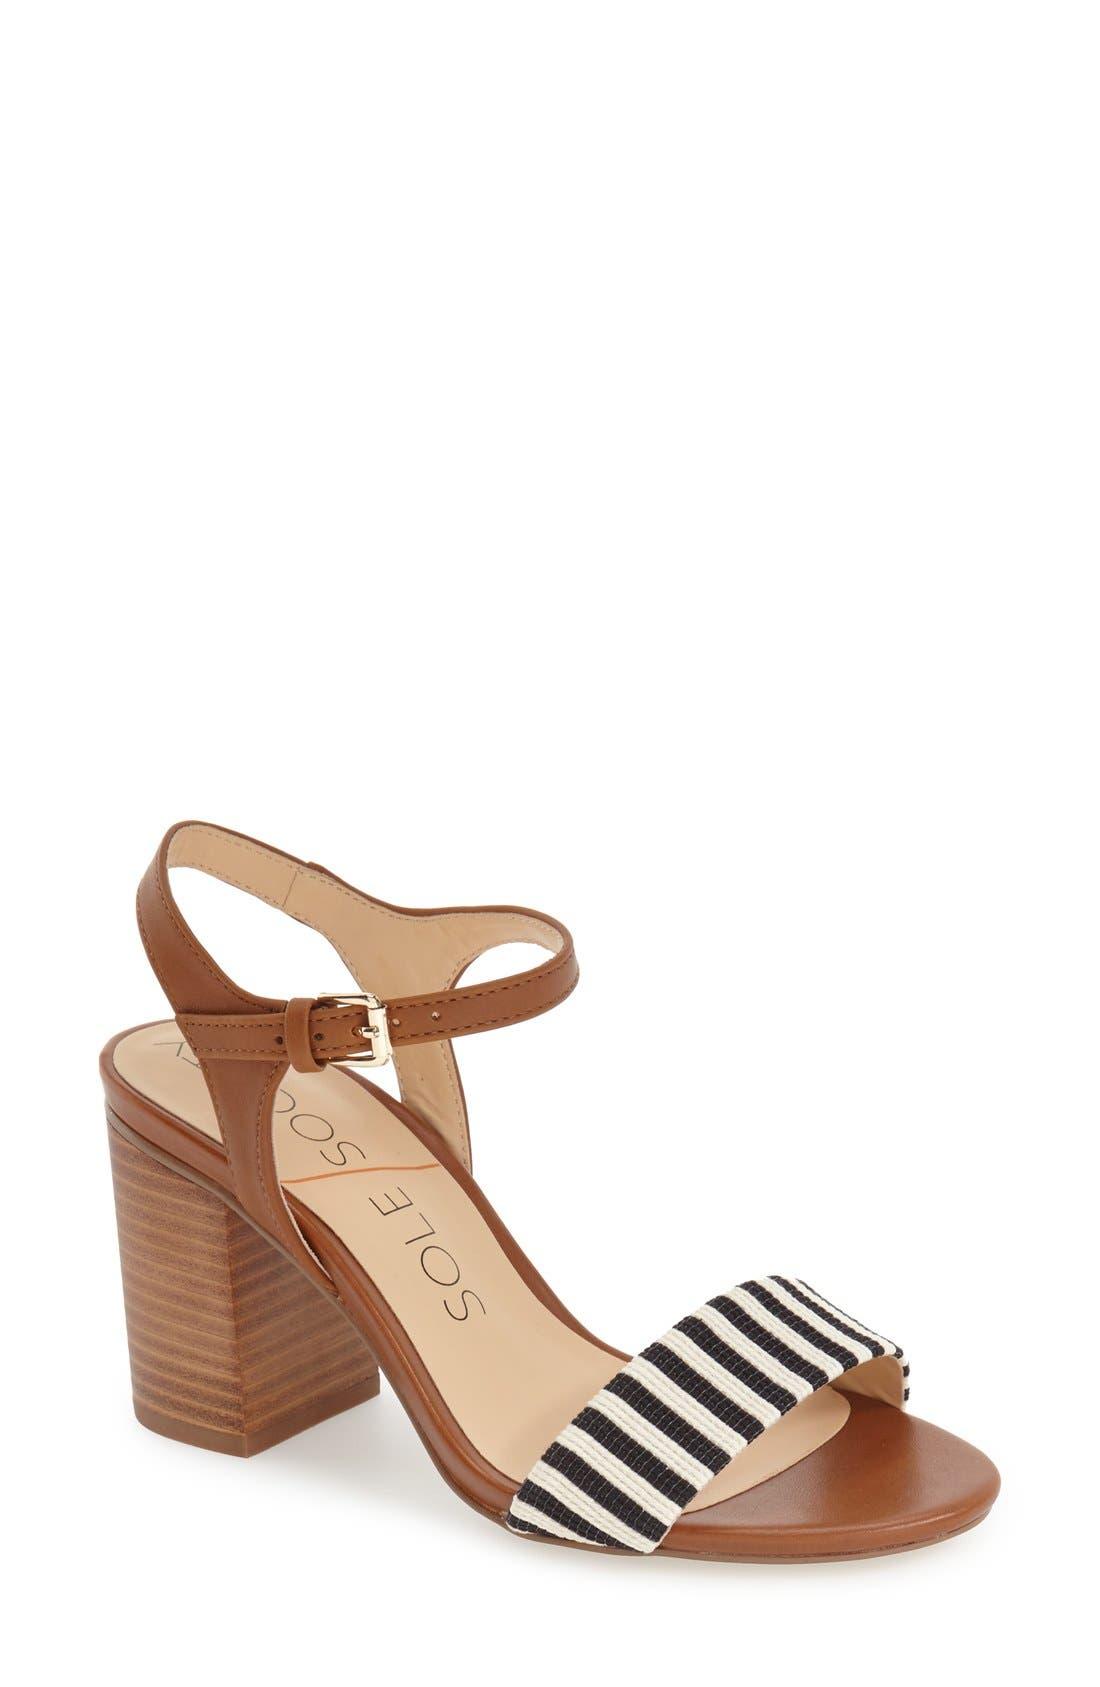 'Linny' Ankle Strap Sandal,                         Main,                         color,